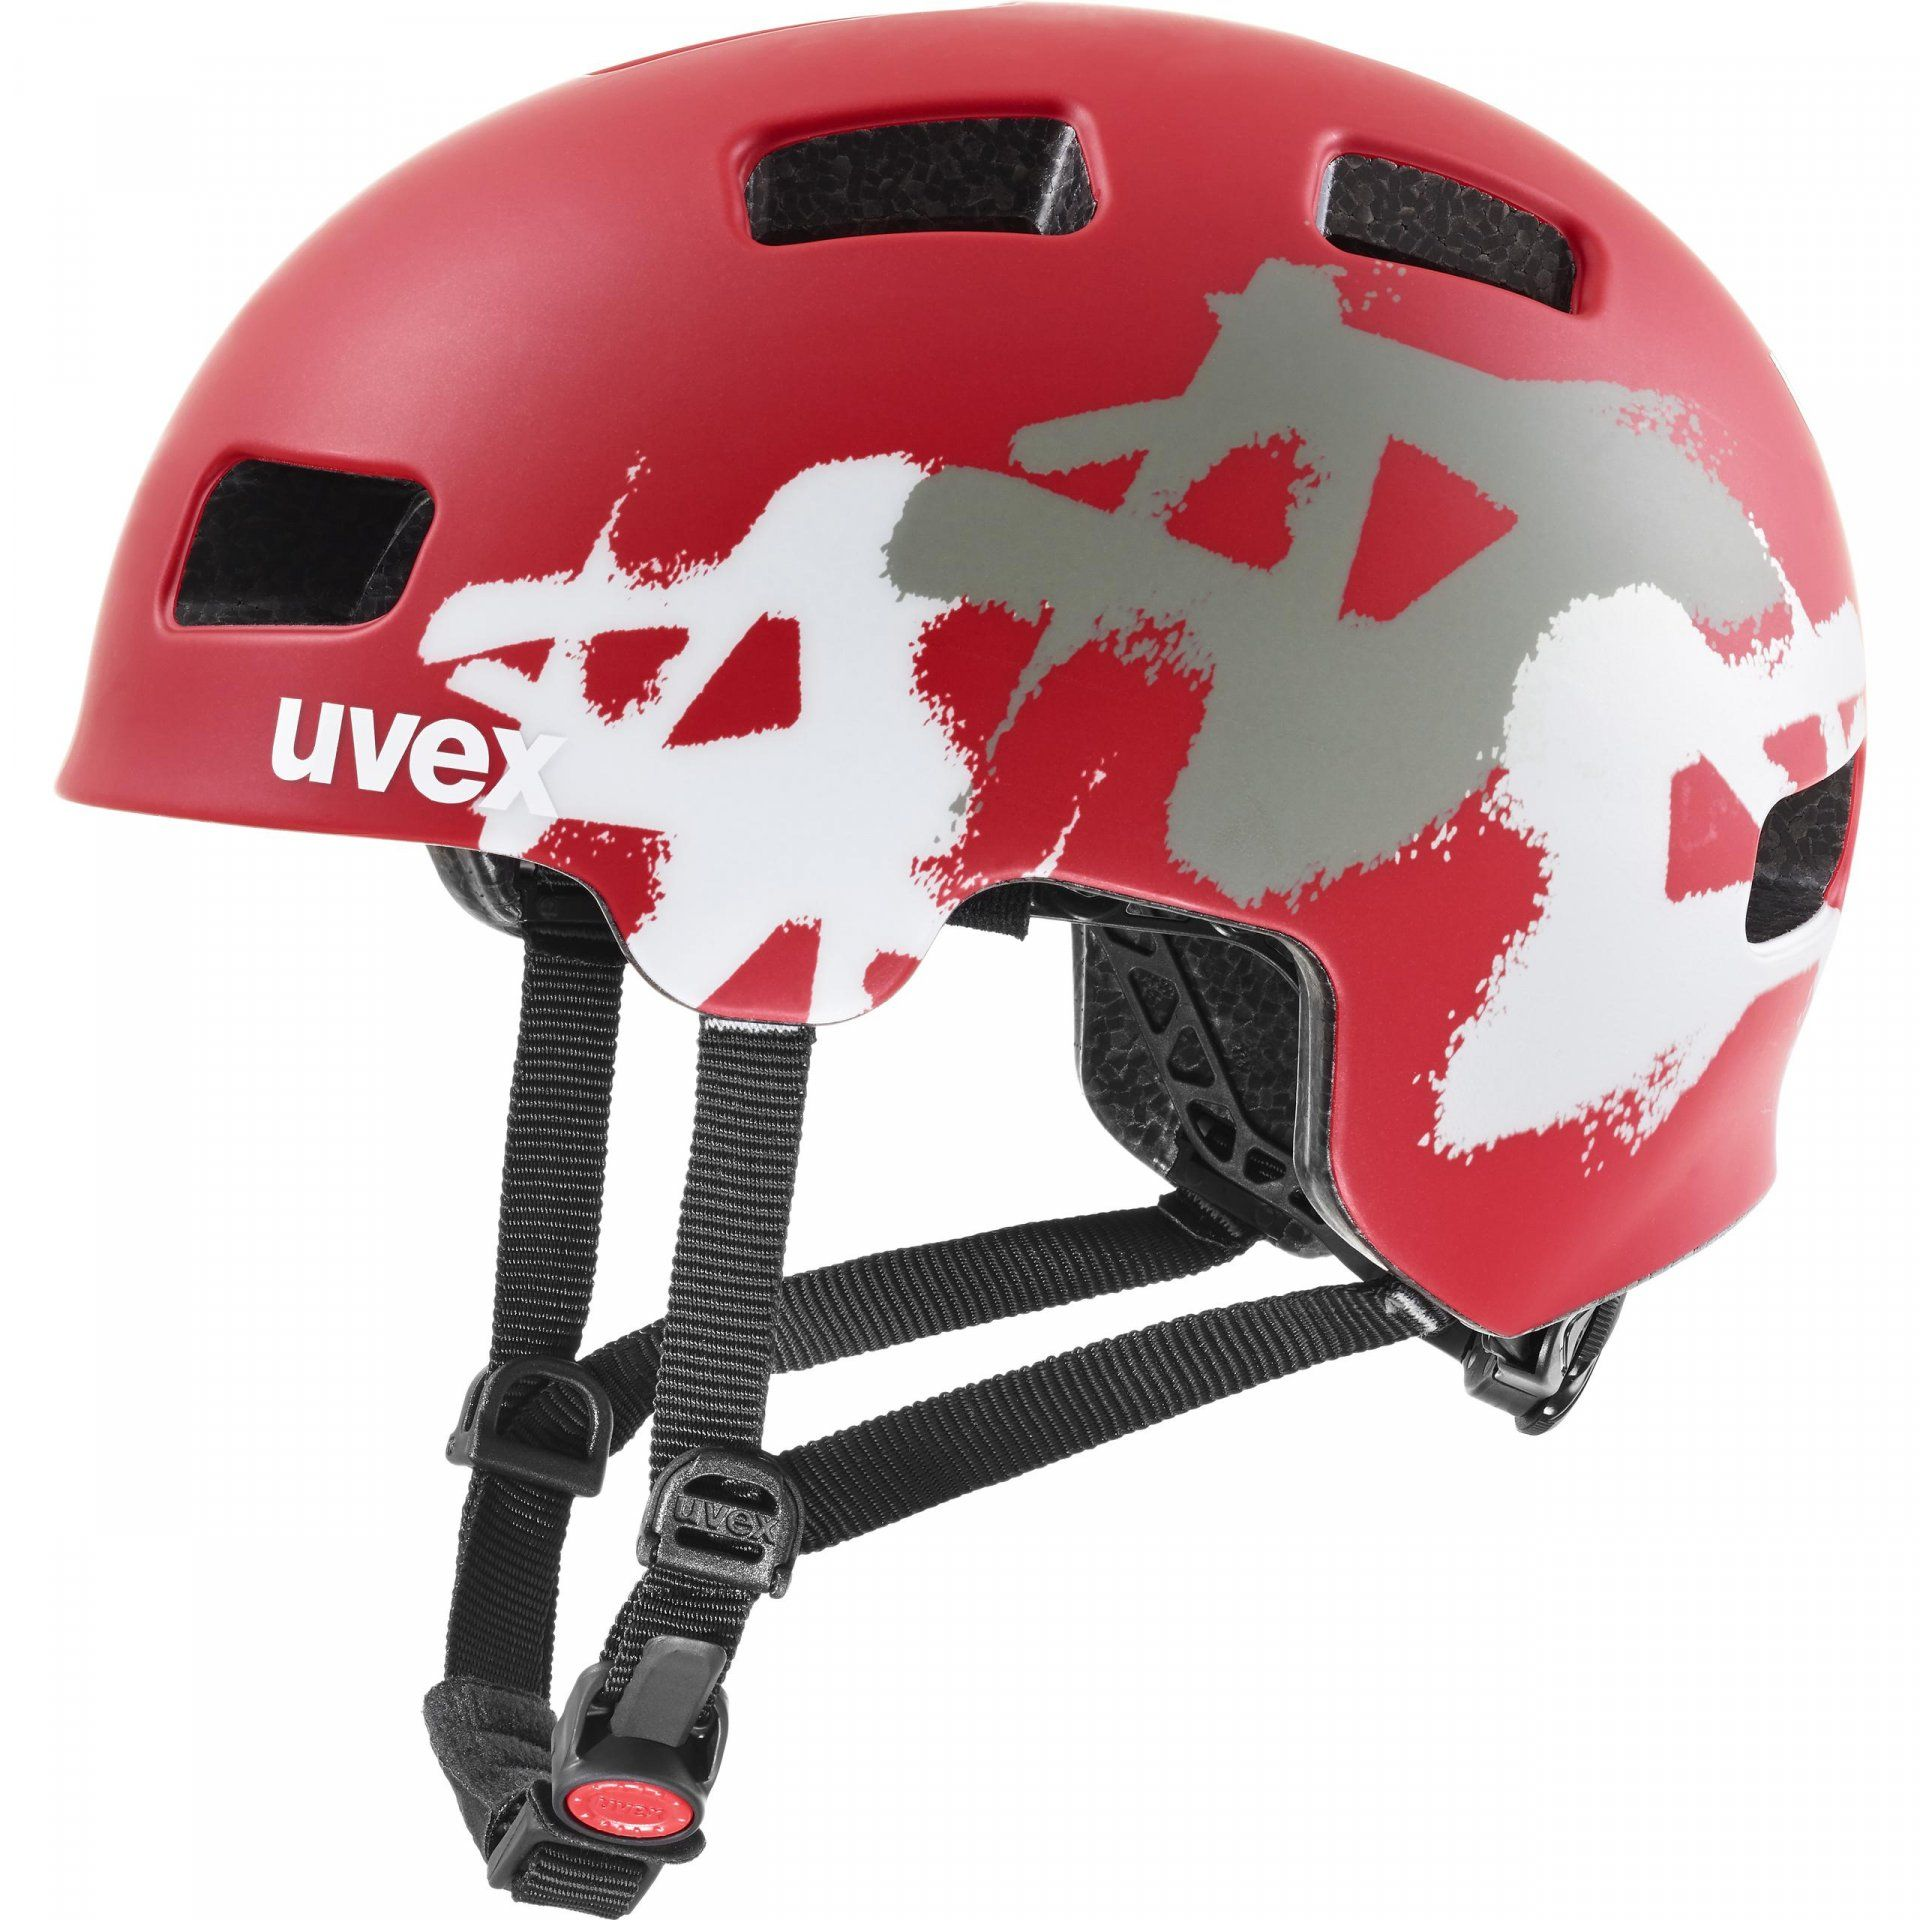 KASK ROWEROWY UVEX HLMT 4 CC RED GRAFFITI 1